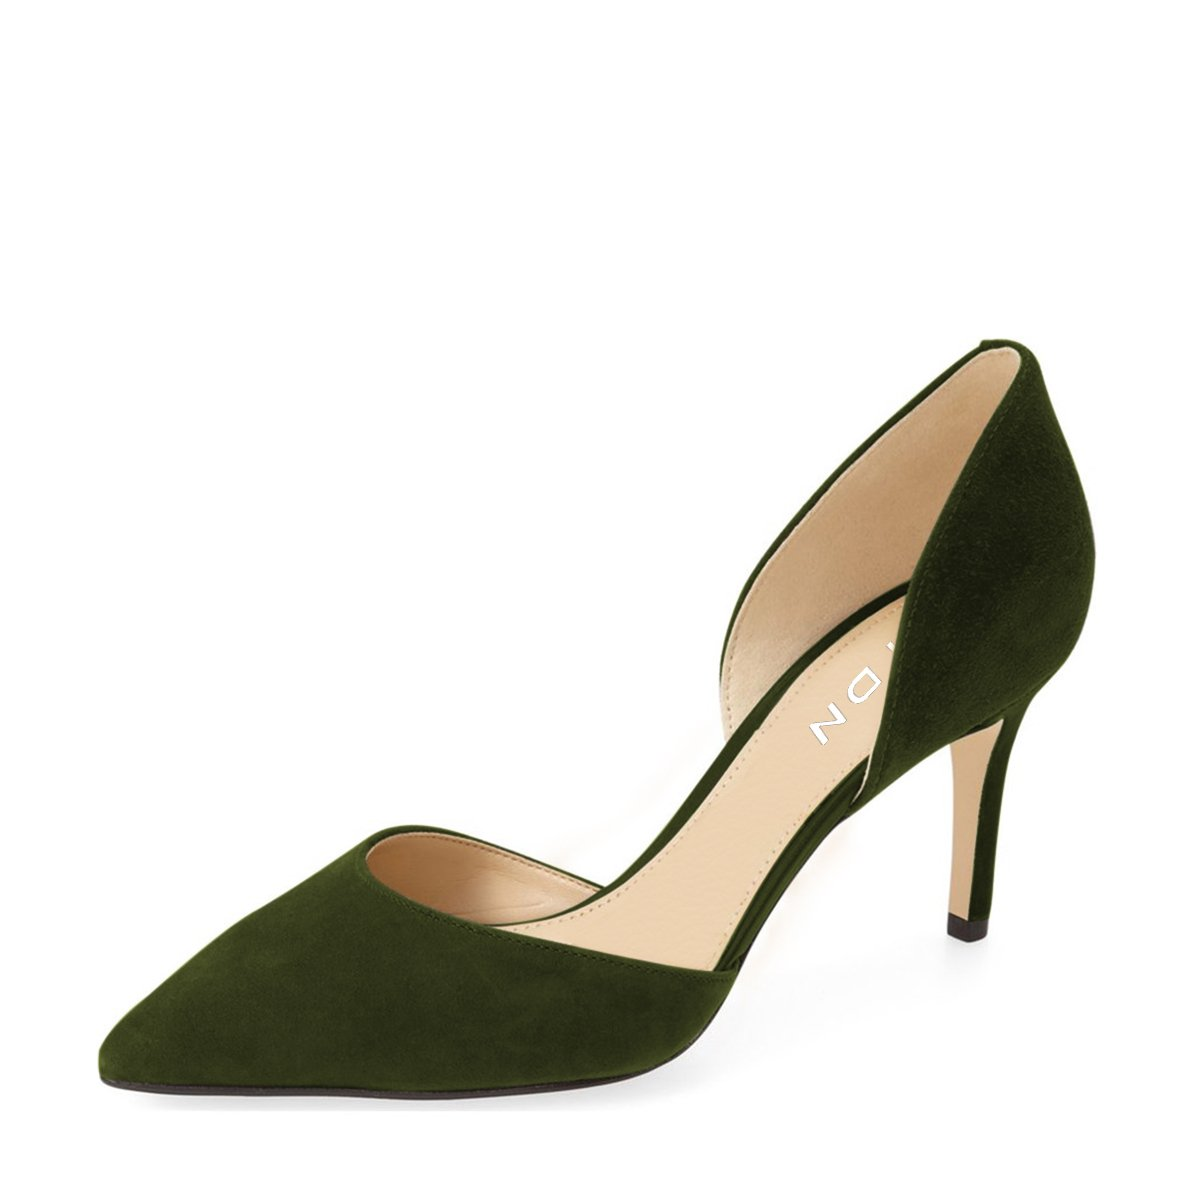 YDN Women Classic Low Heels D'Orsay Pumps Suede Pointed Toe Slip On Dressy Stilettos Shoes B01N2TGVNS 10 B(M) US|Dark Green